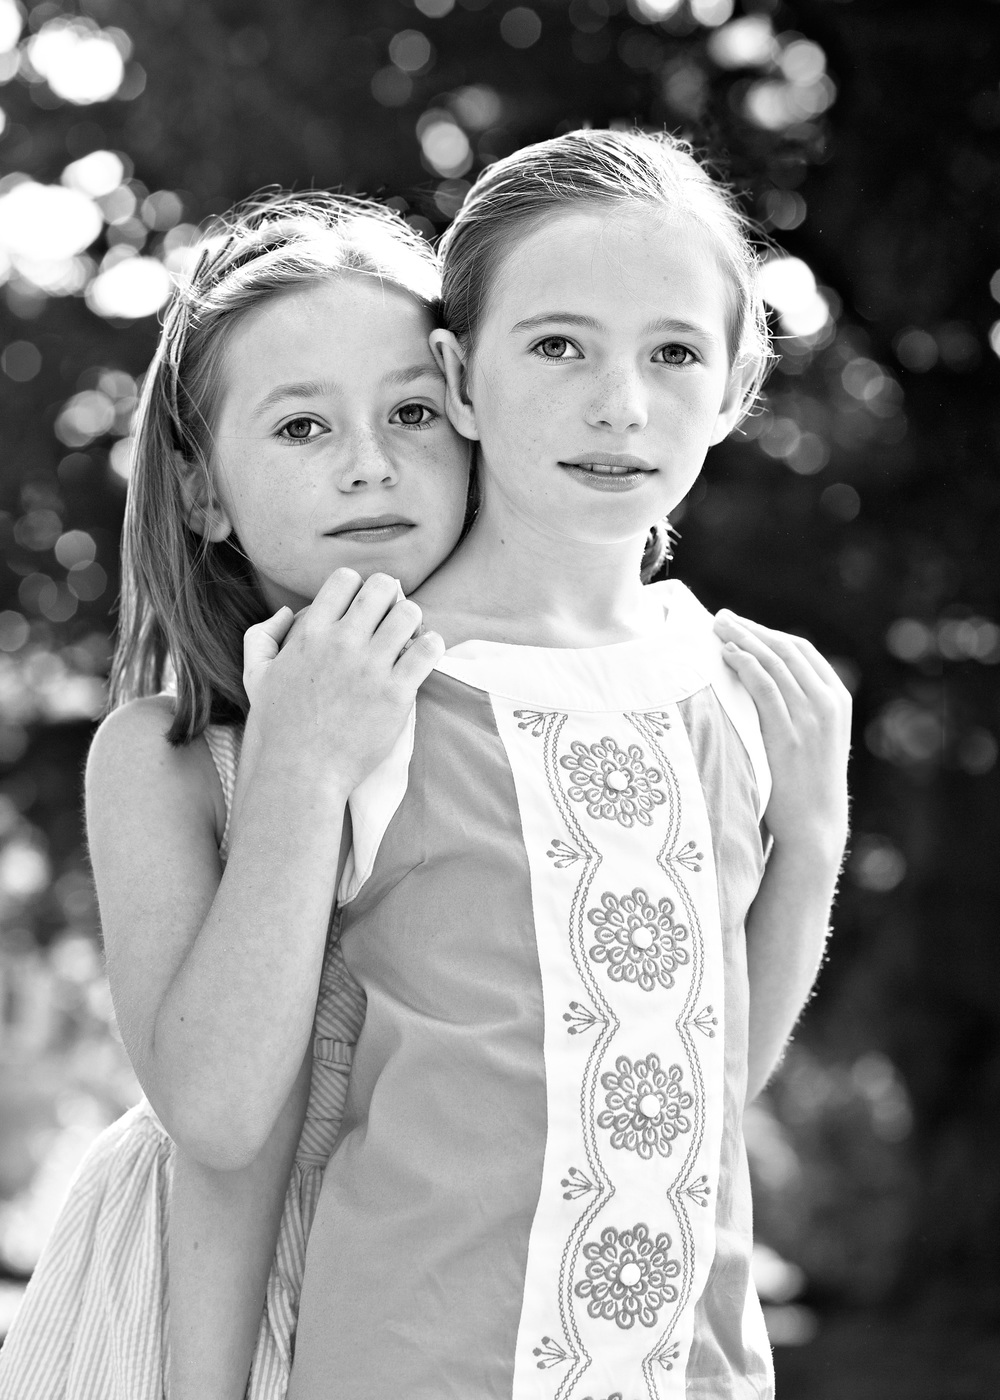 Walnut Creek Family Photographer ©ninapomeroy.com siblings children families sisters